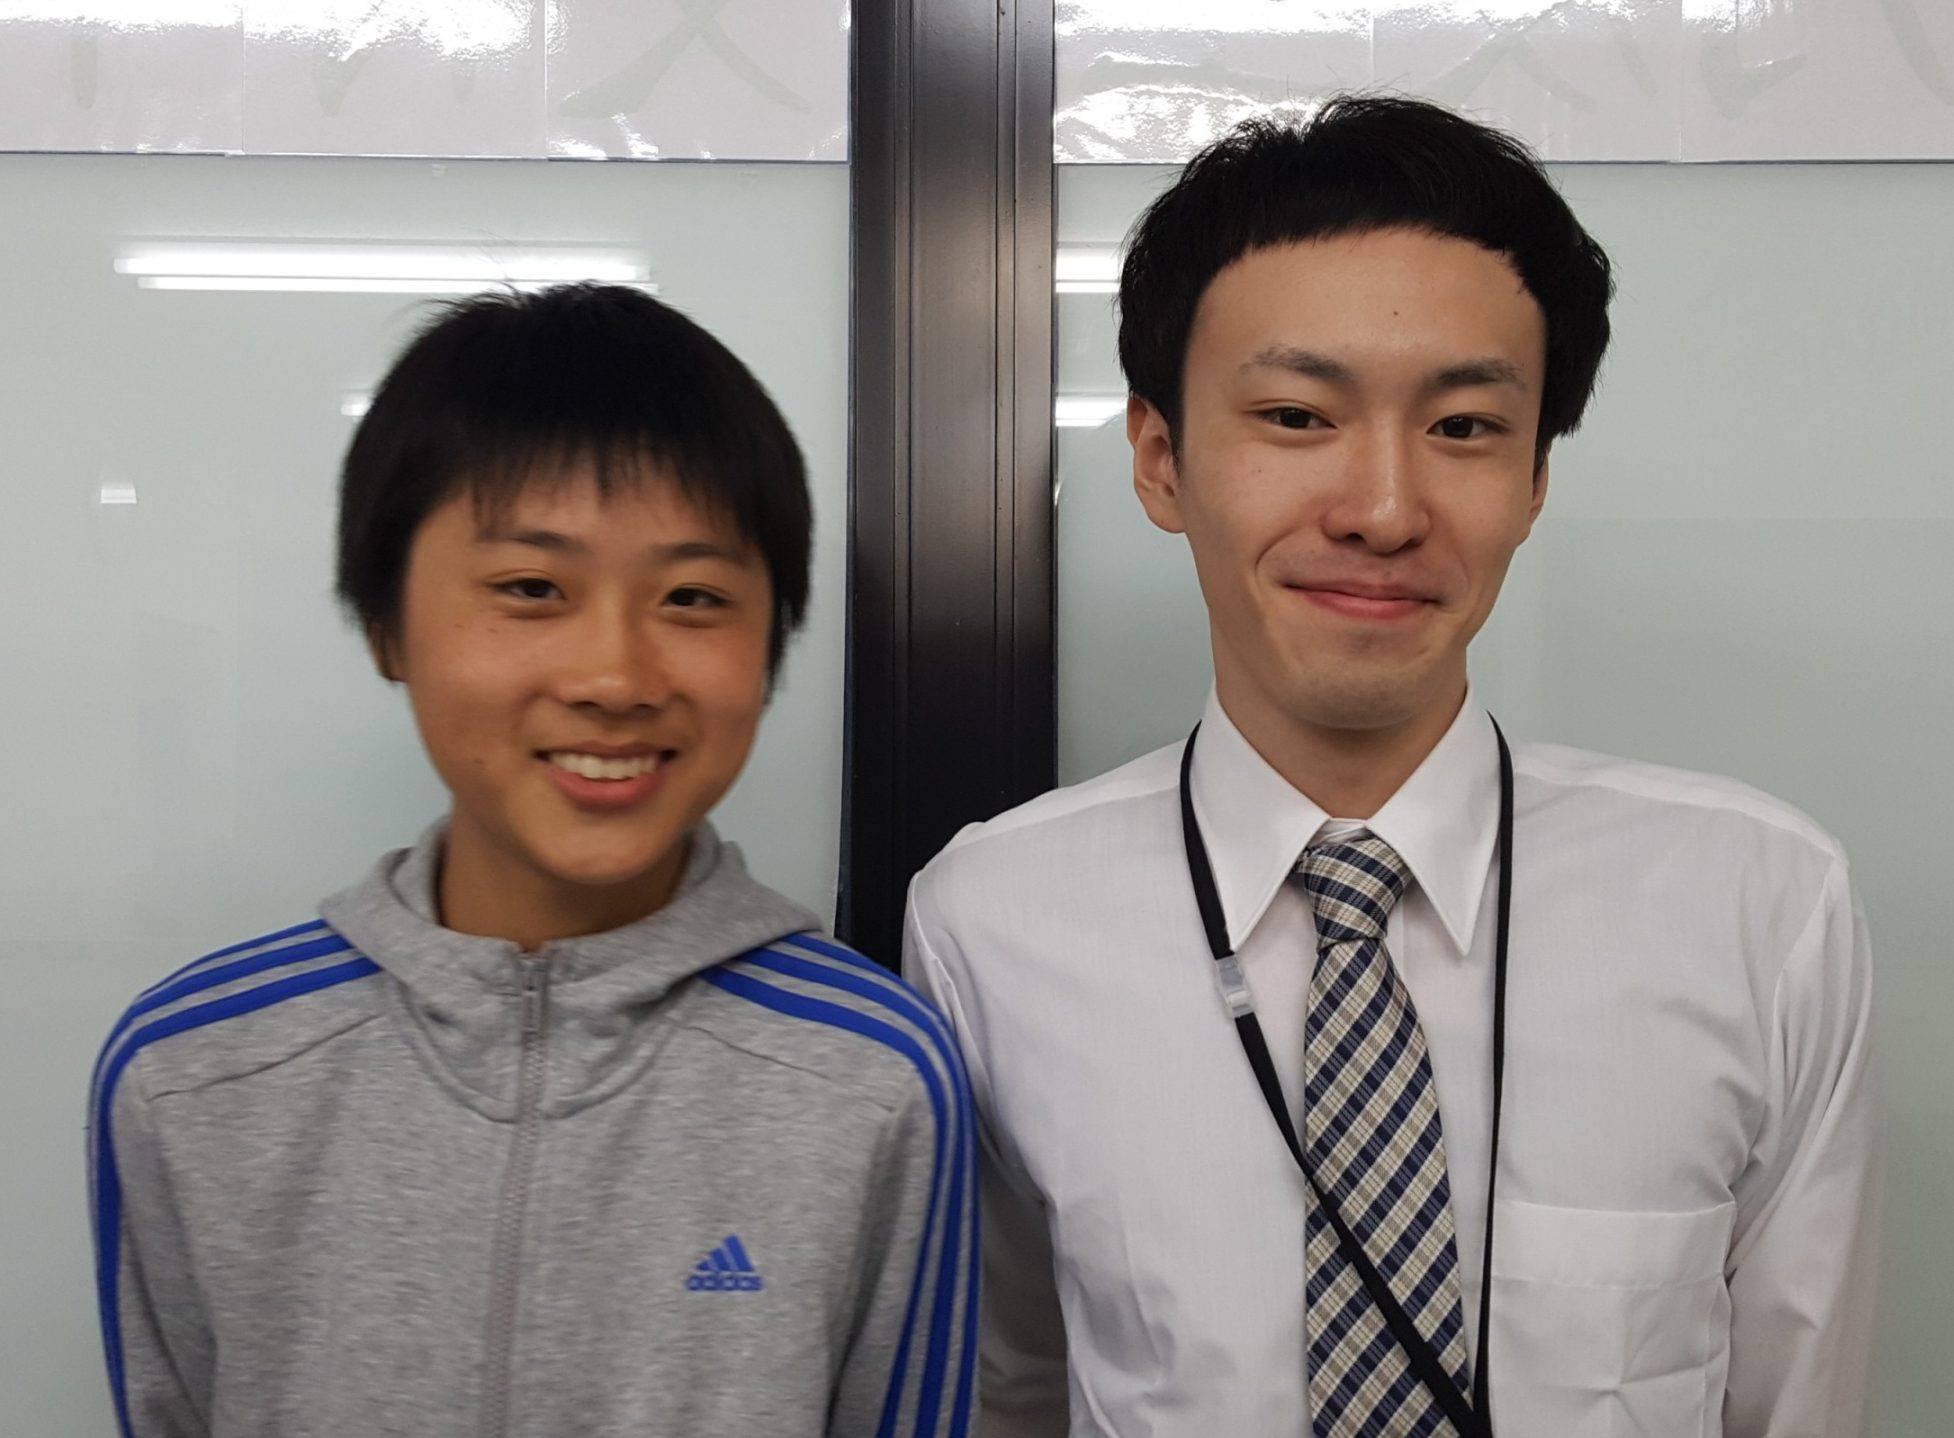 H29夏 中学2年 齋藤翔くん 宮森先生